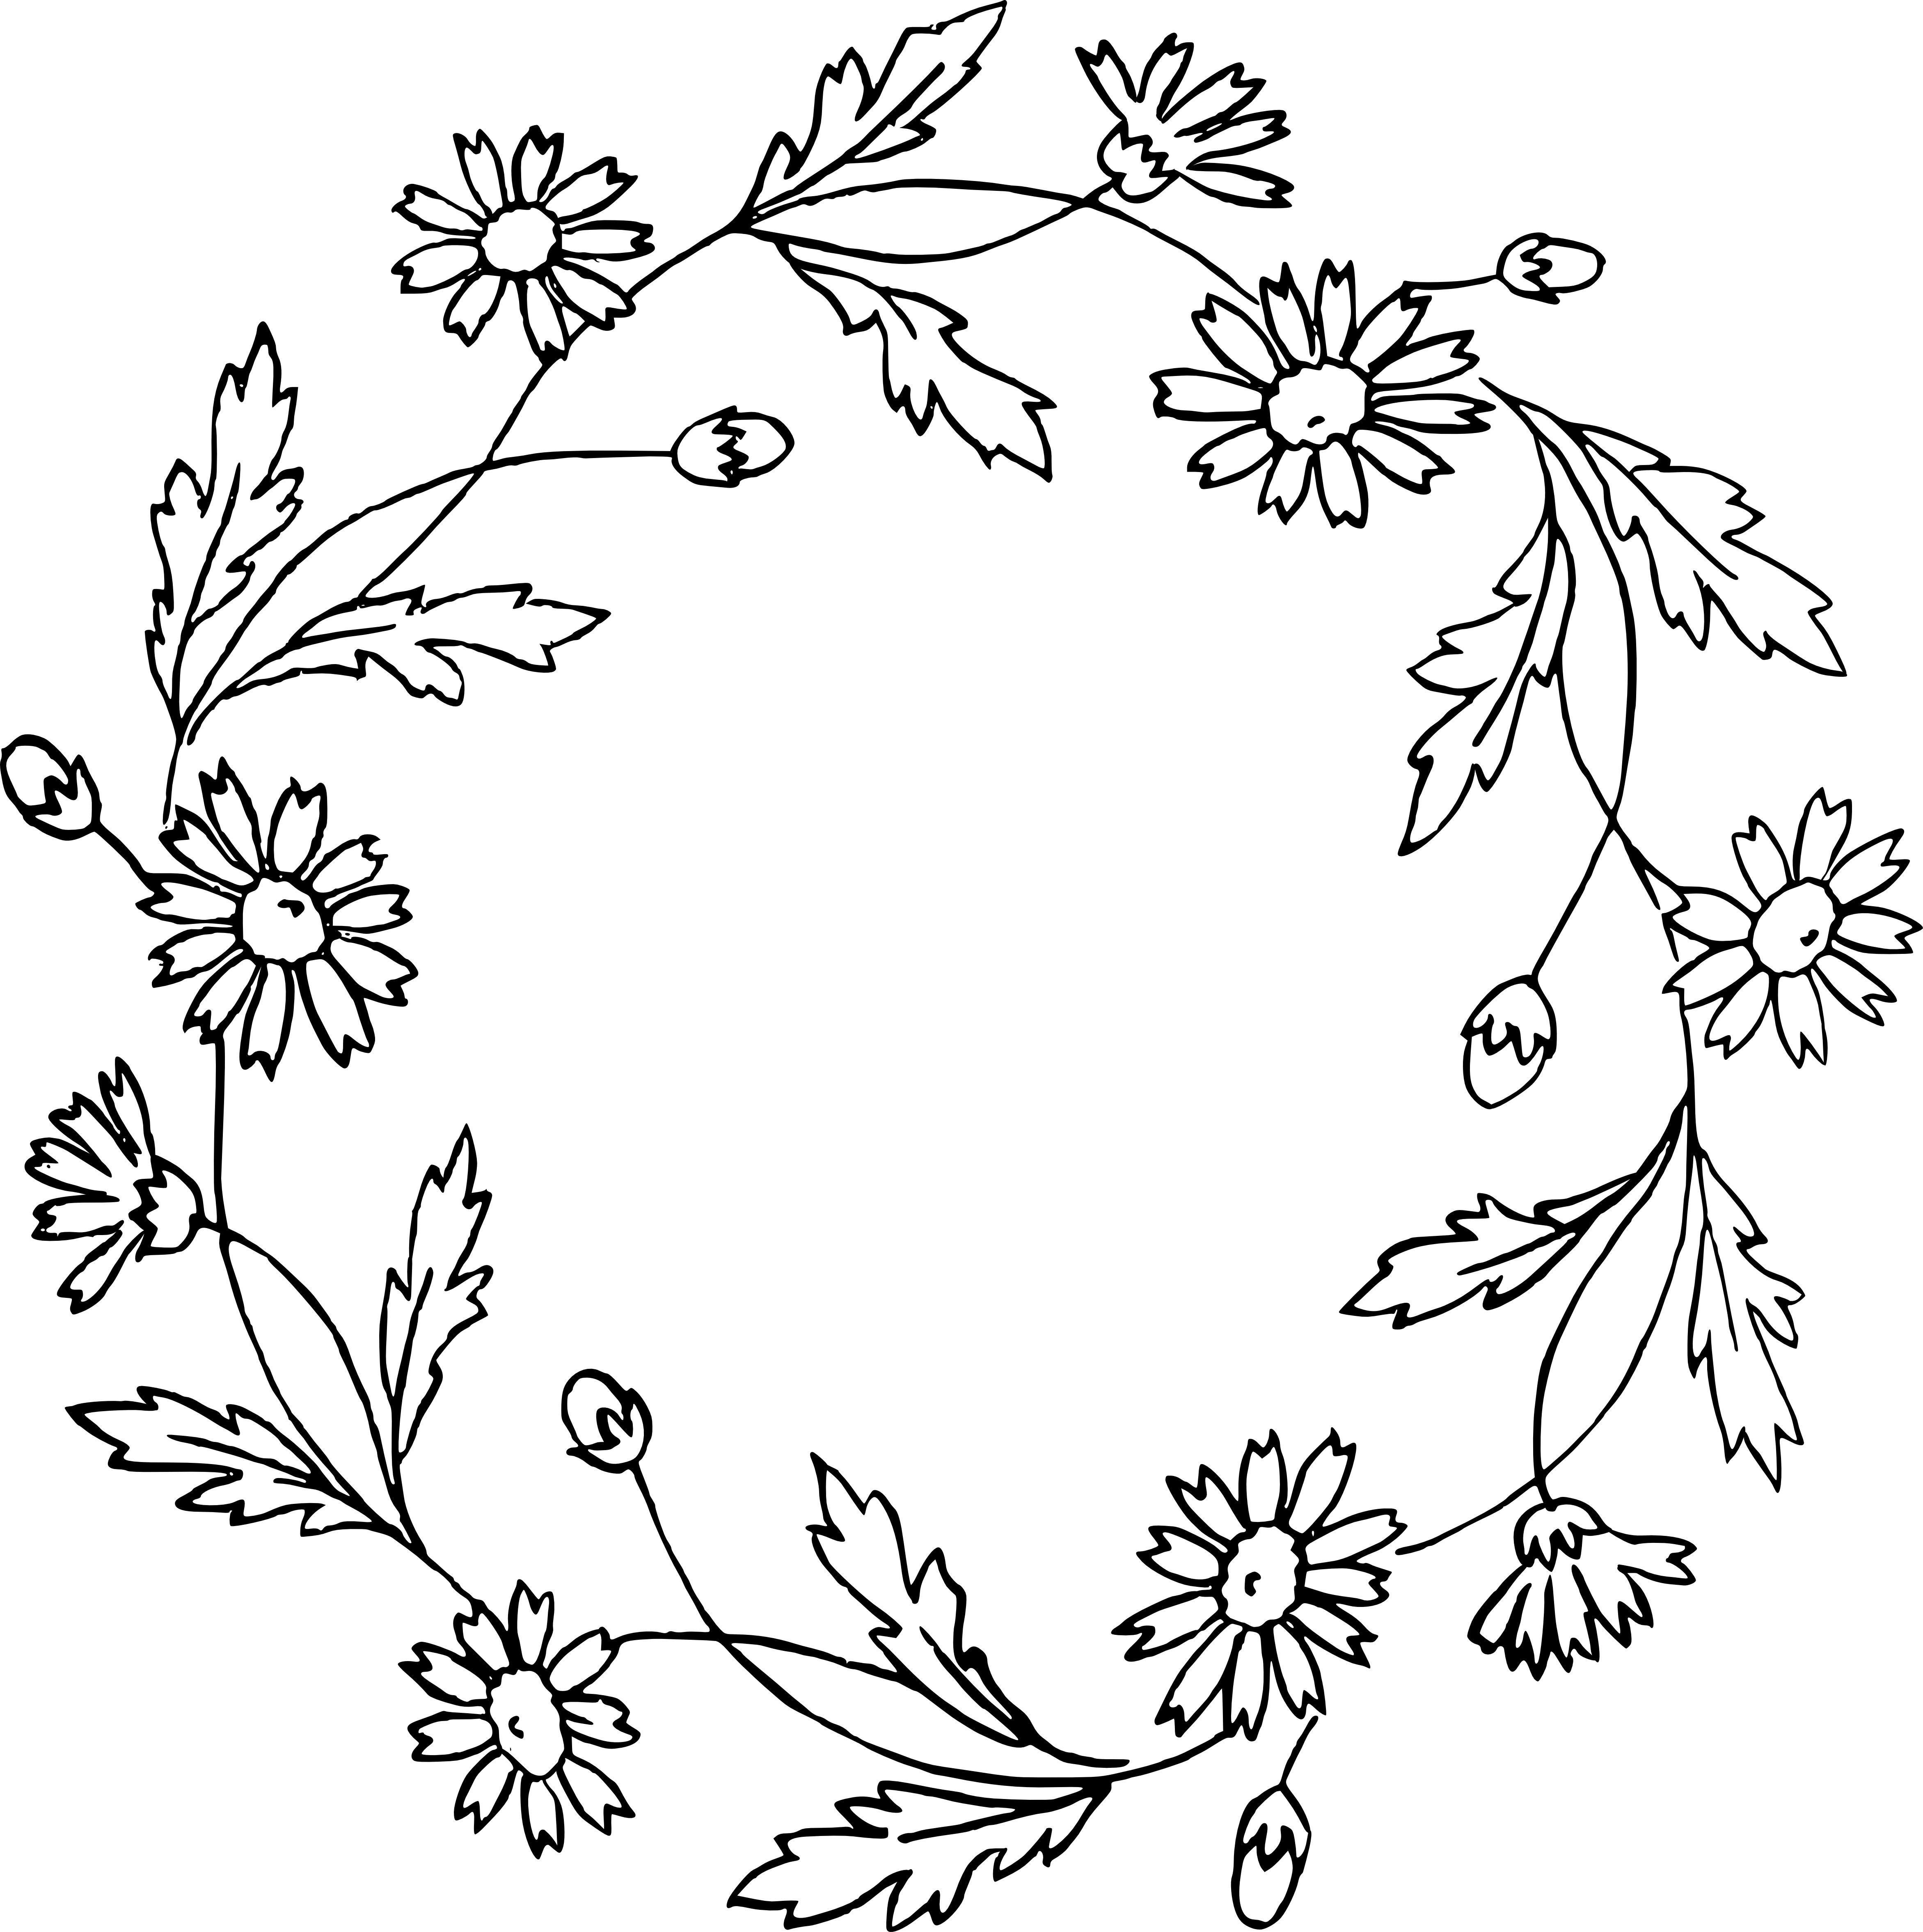 medium resolution of daisy flower cip art silhouette floral wreath clip art vector images 4686 4707